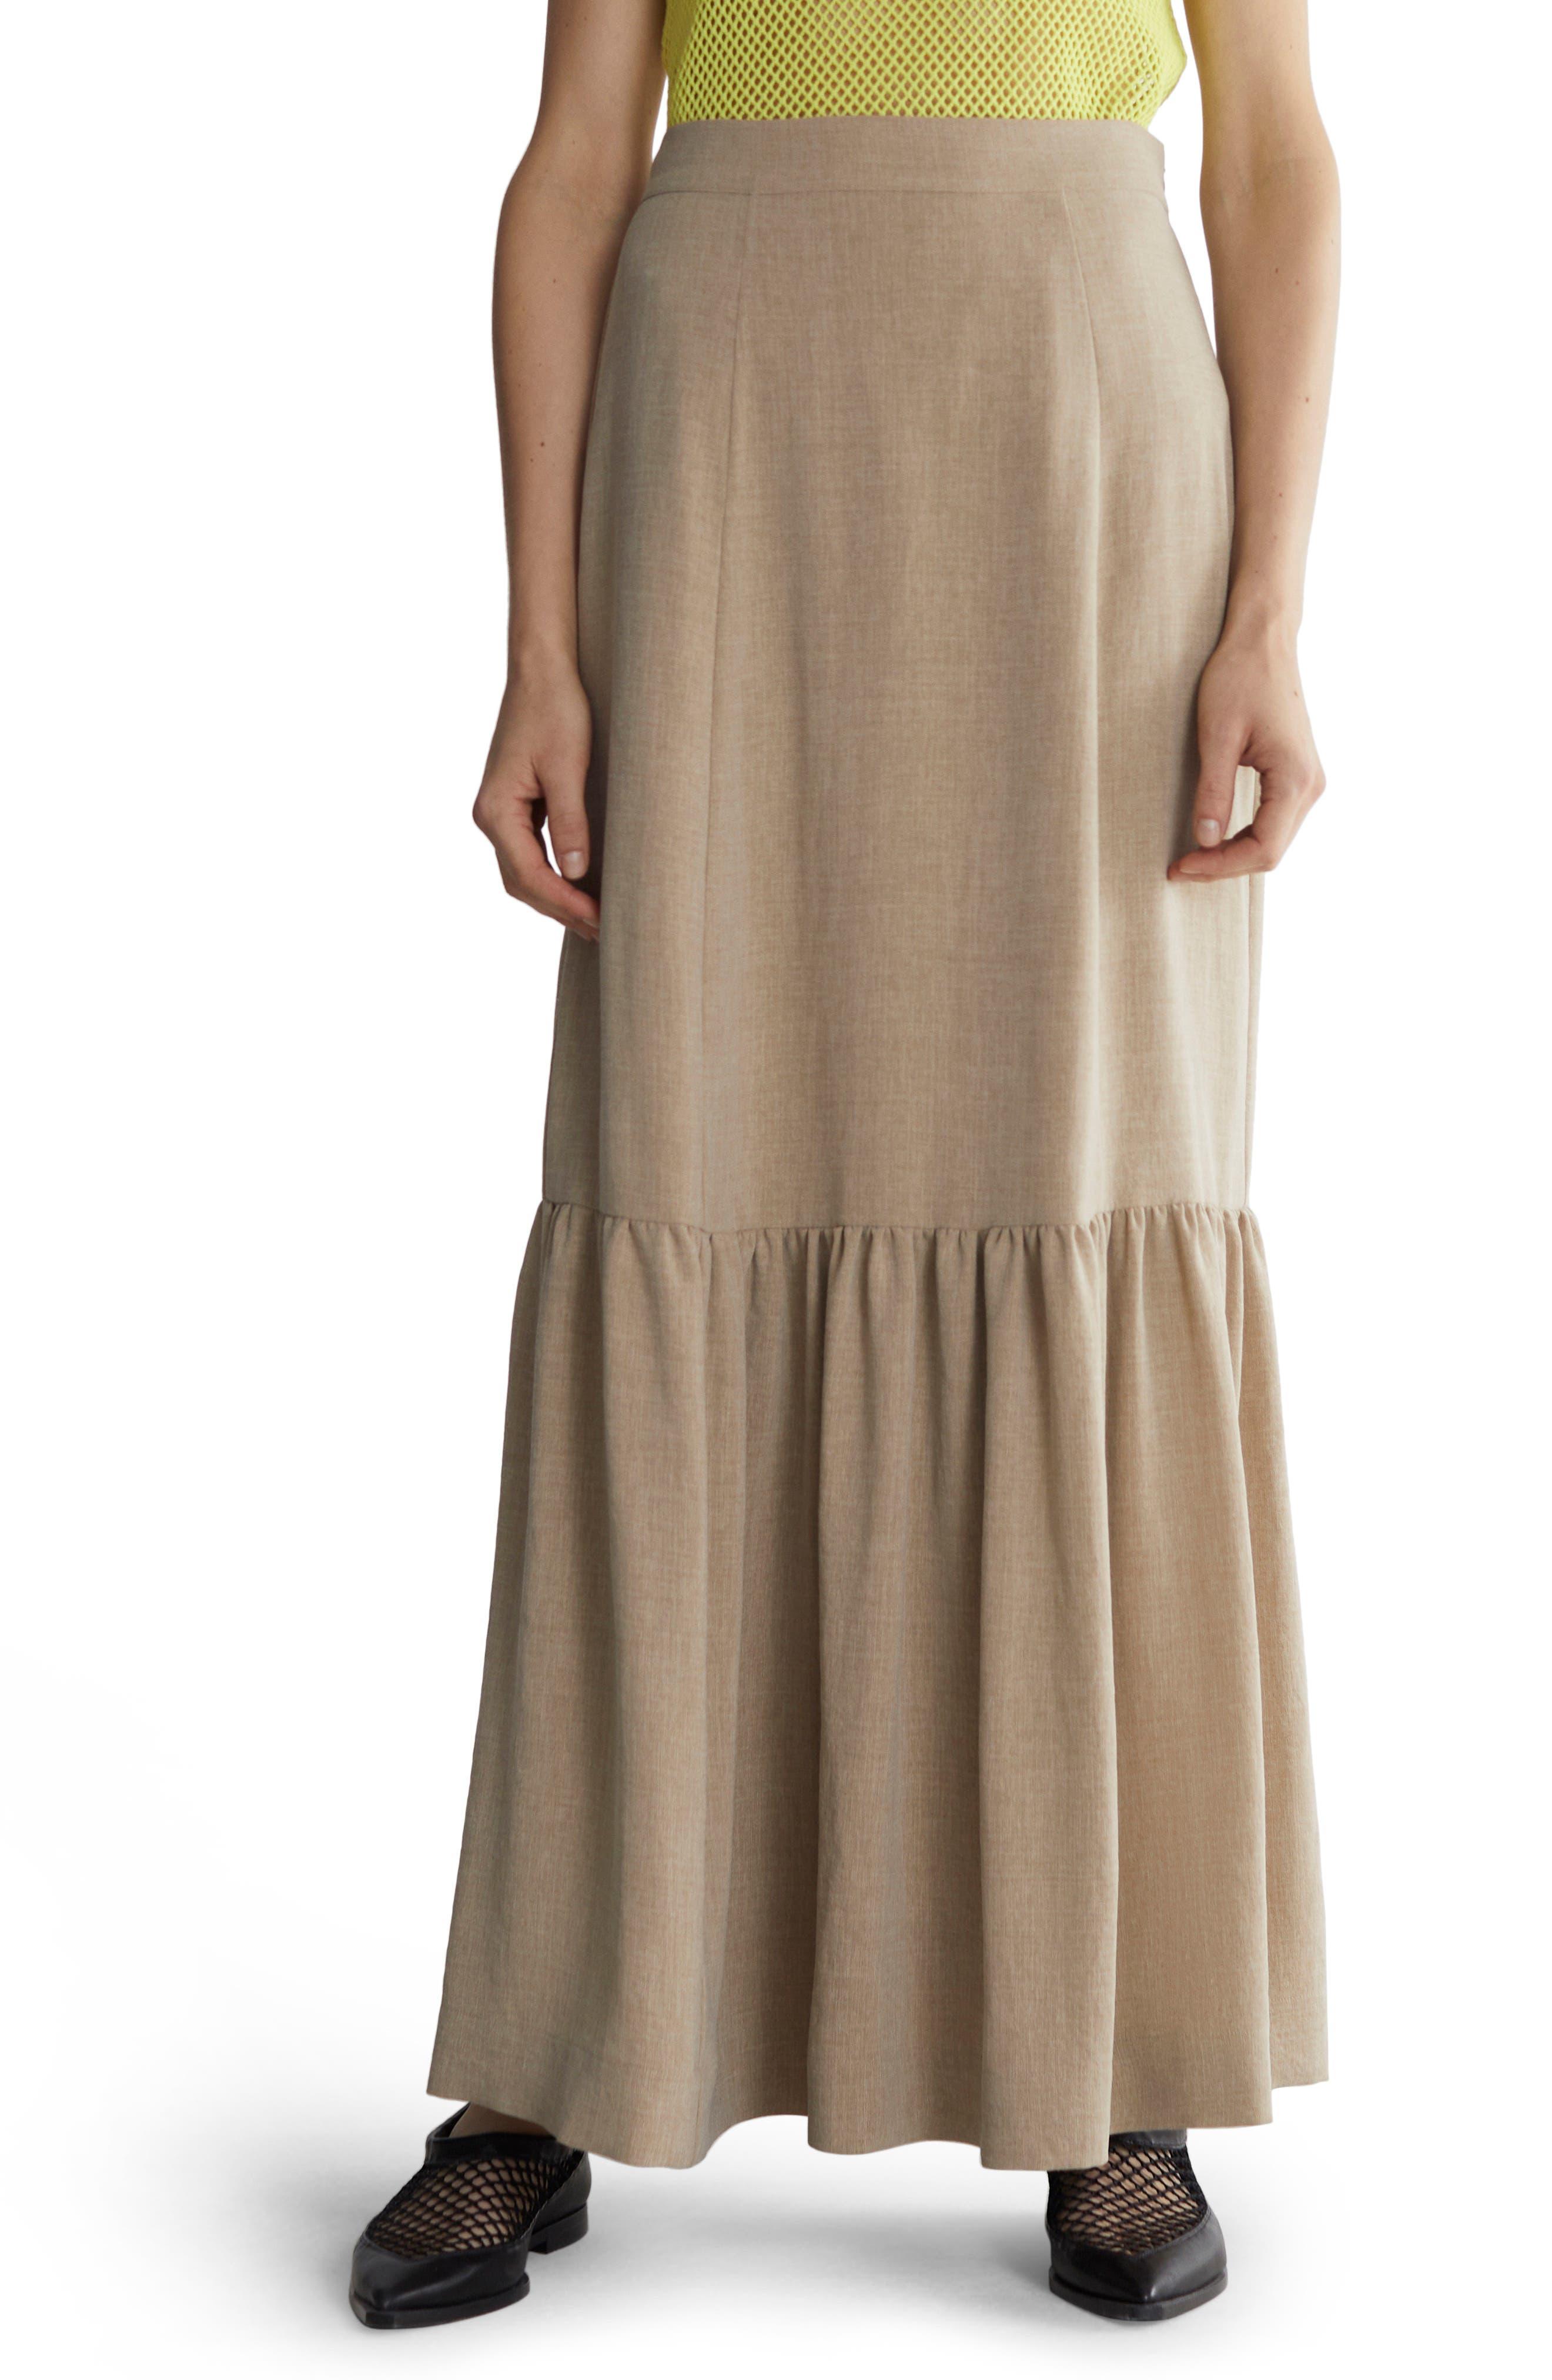 Image of RODEBJER Zegiga Maxi Skirt